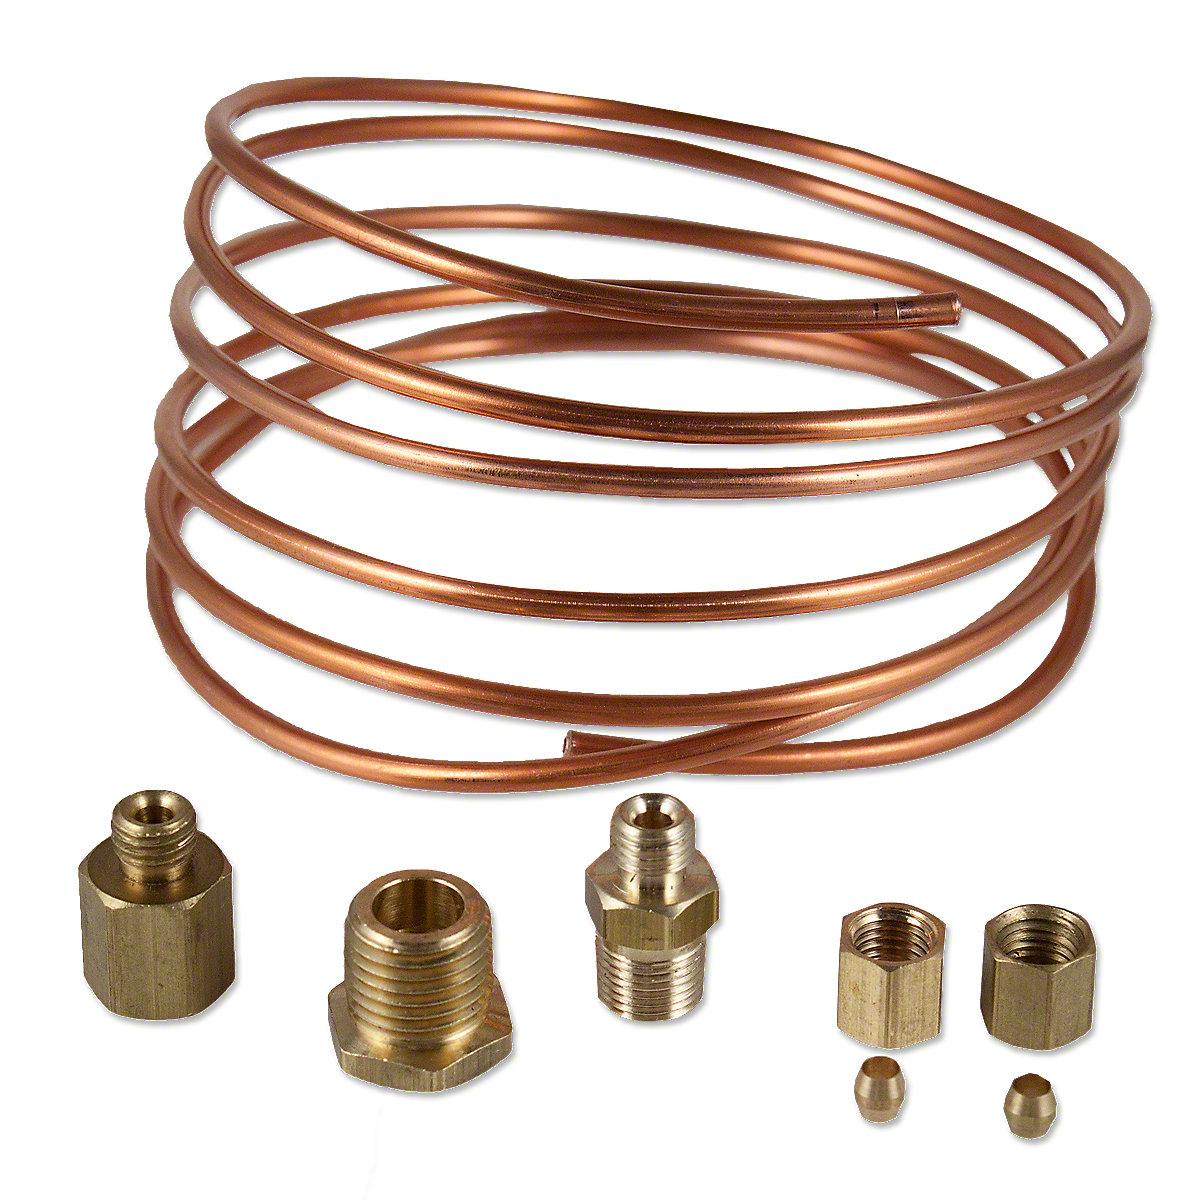 Oil Pressure Copper Line Kit For Massey Ferguson And Massey Harris Tractors.